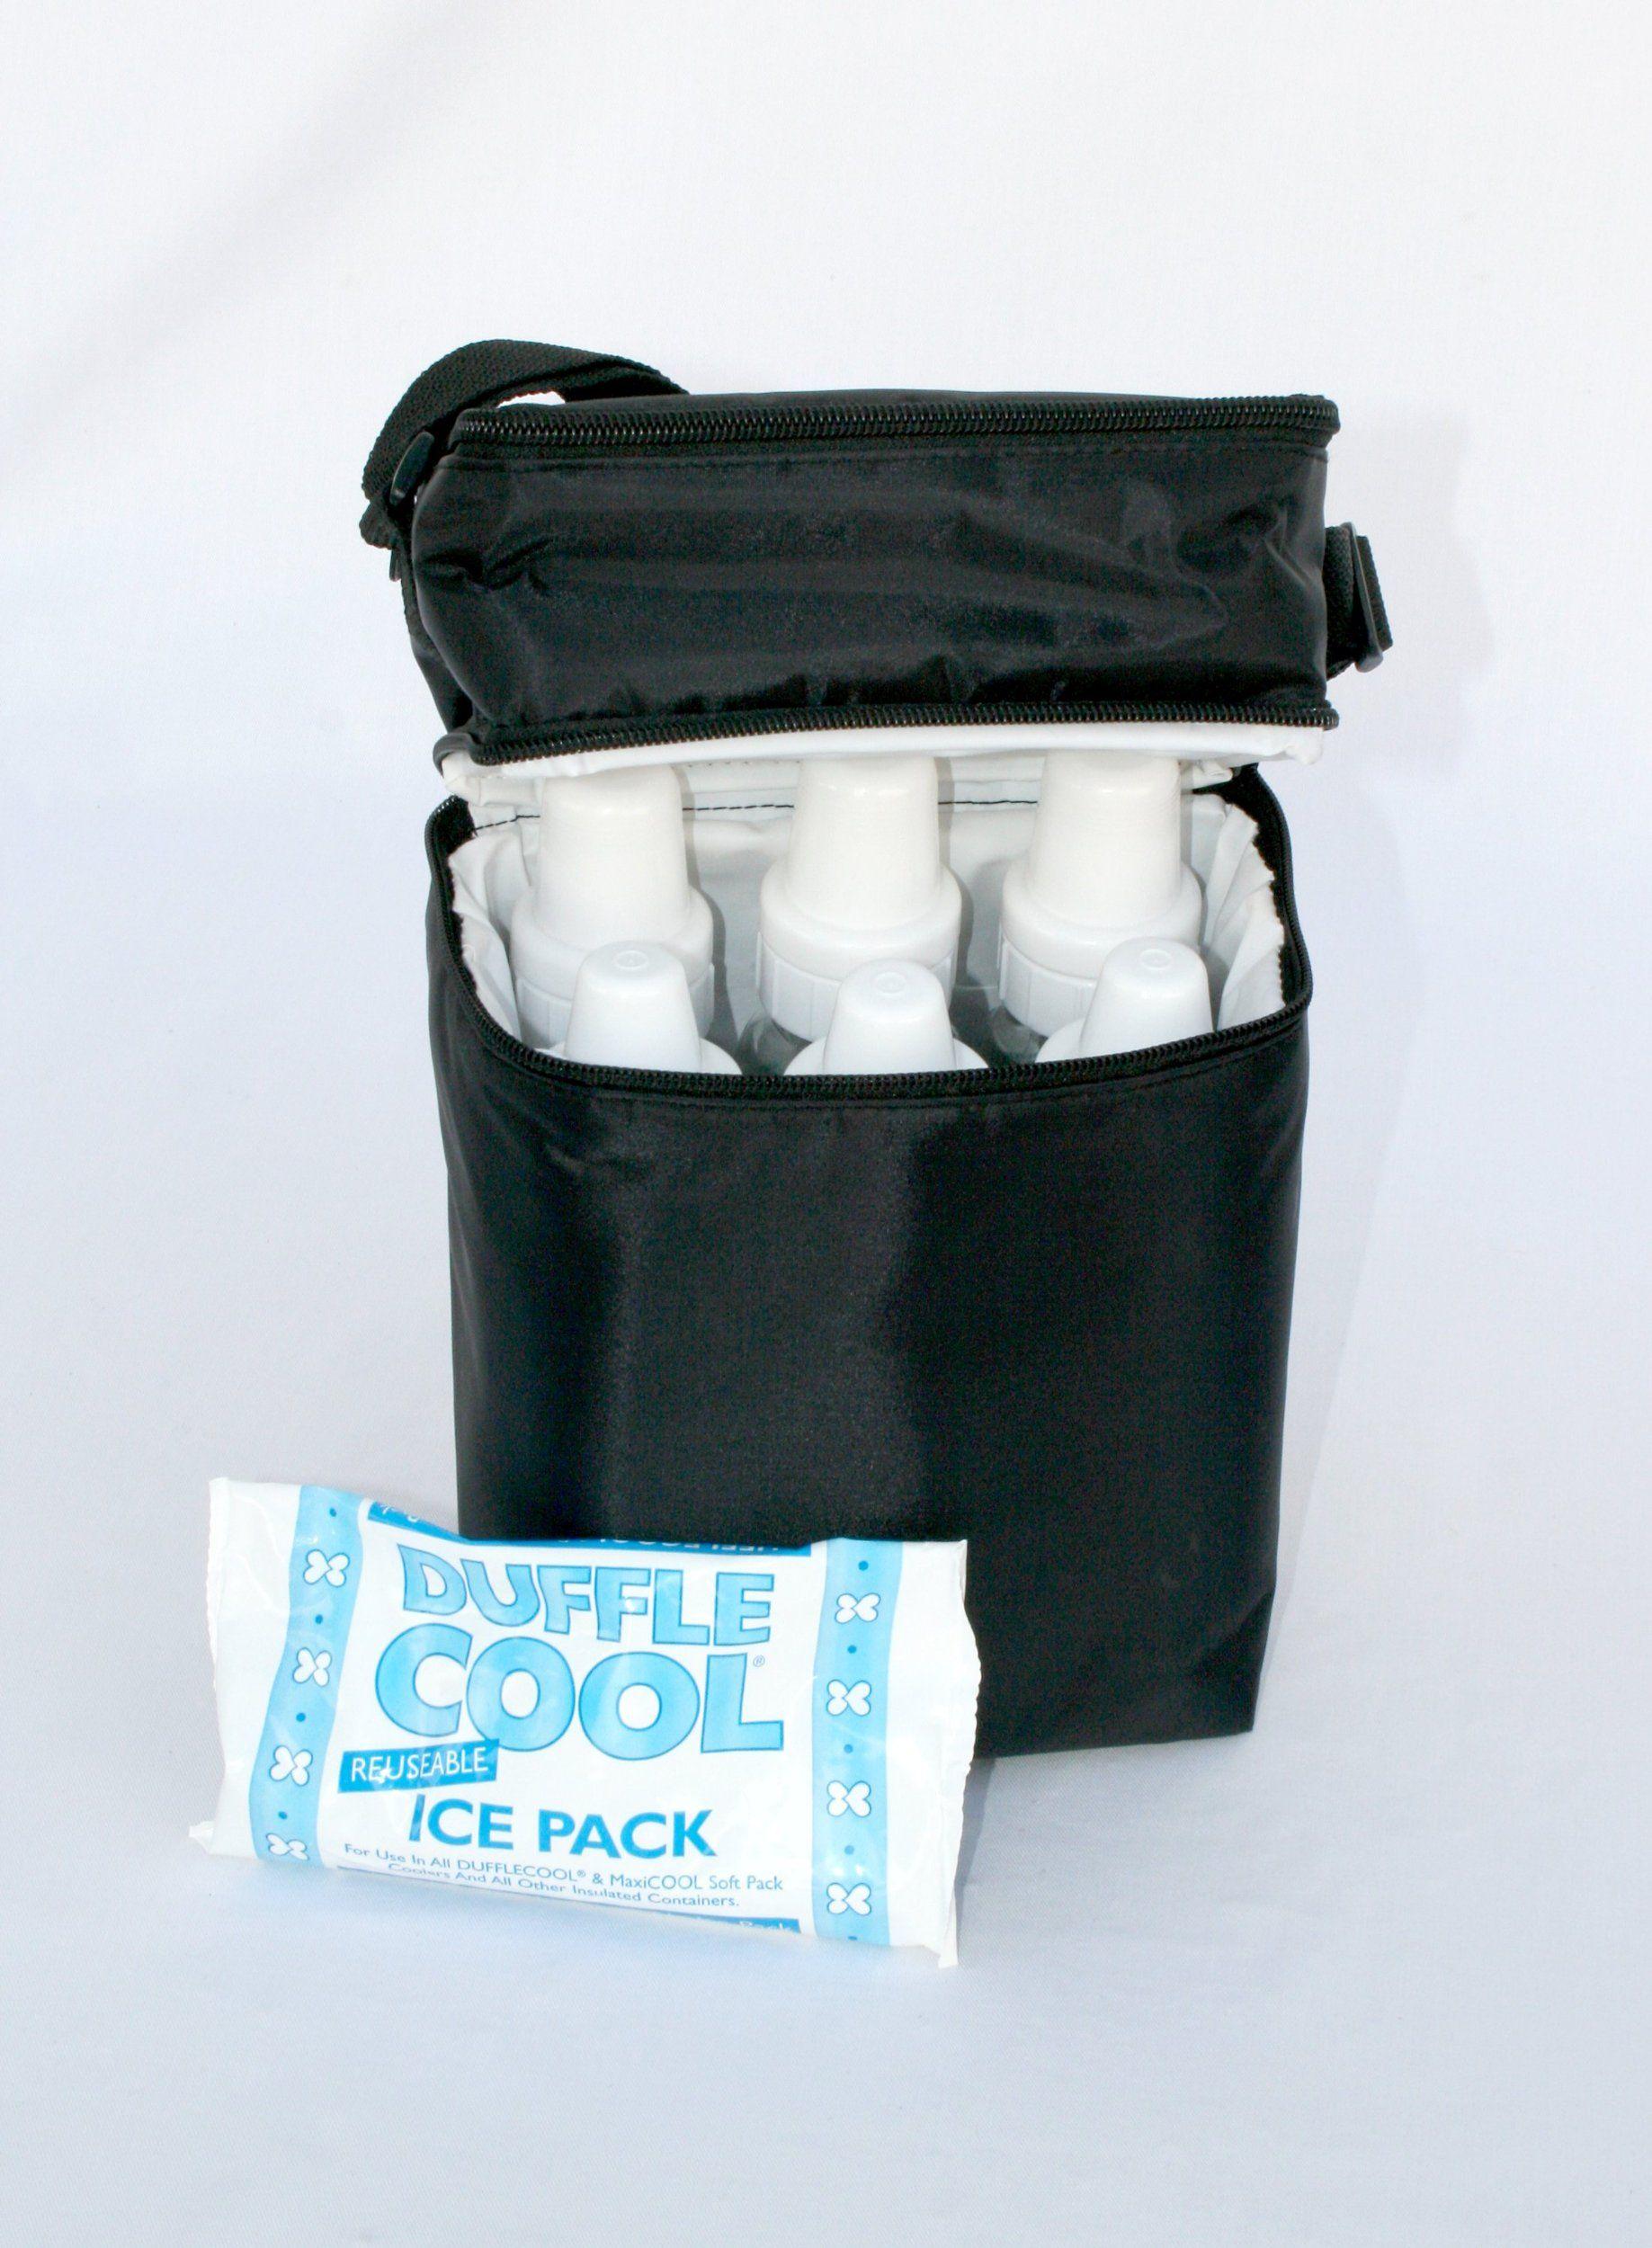 AmazonSmile : JL Childress 6 Bottle Cooler, Black : Baby Bottle Tote Bags : Baby